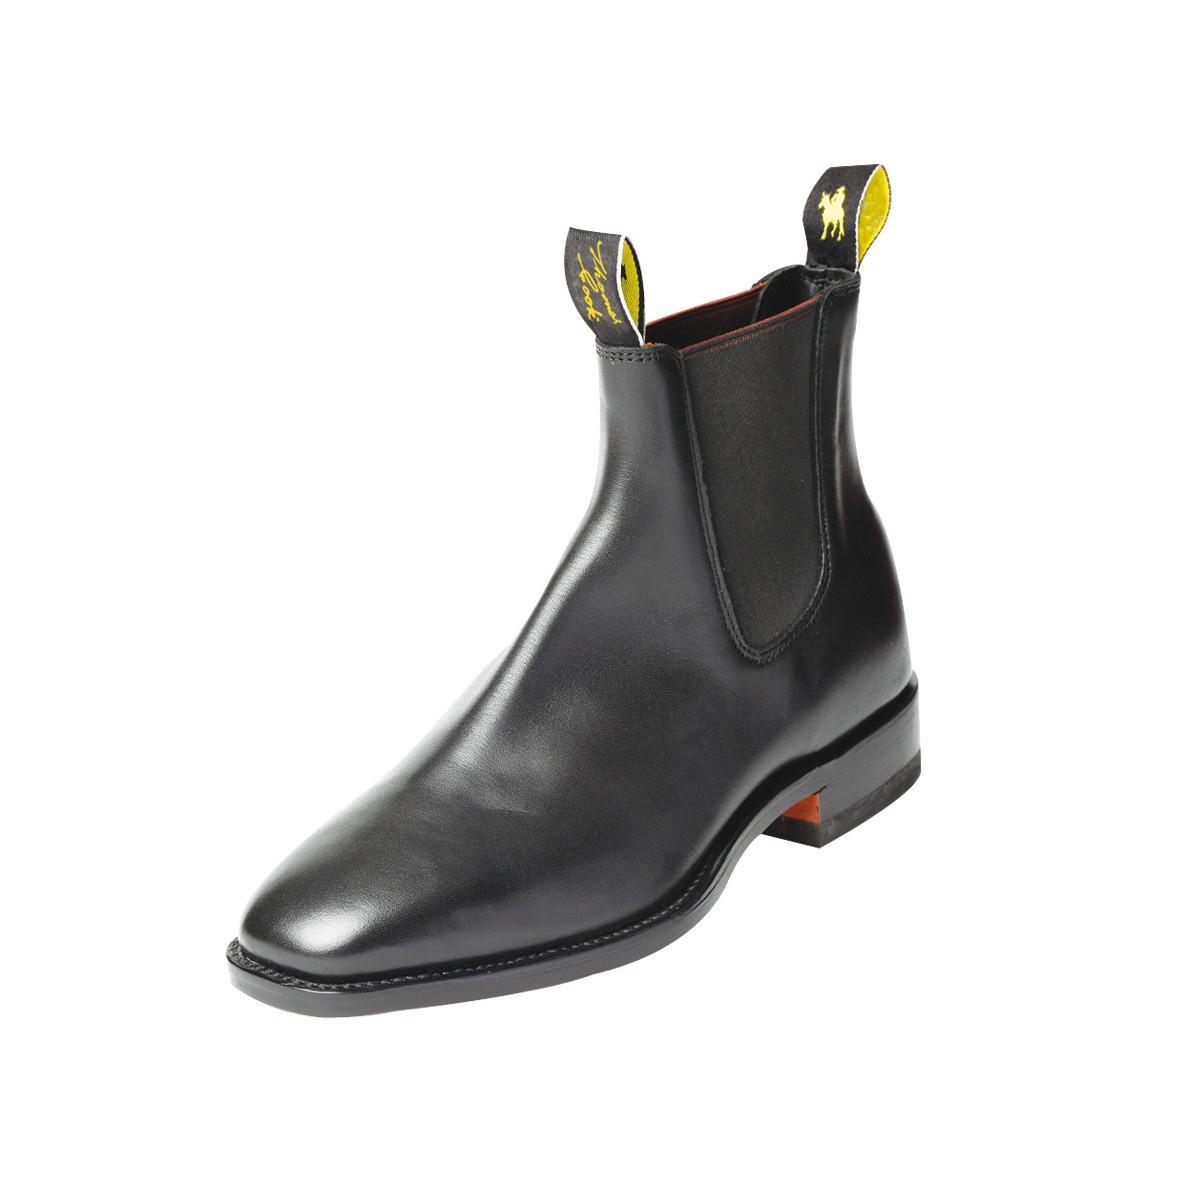 Thomas Cook Trentham Mens Dress Boots Black